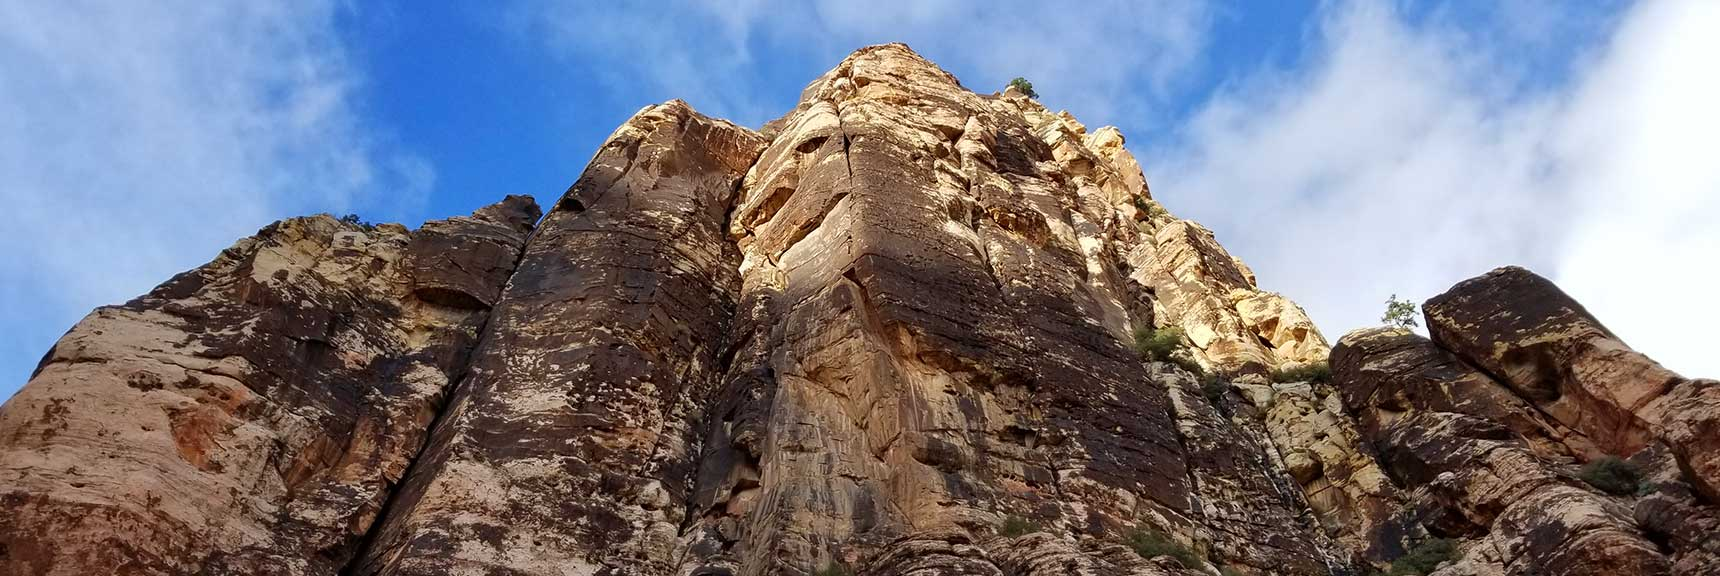 Mescalito Peak Viewed from the Gap Between Mescalito Peak and Juniper Peak in Pine Creek Canyon, Red Rock National Park, Nevada